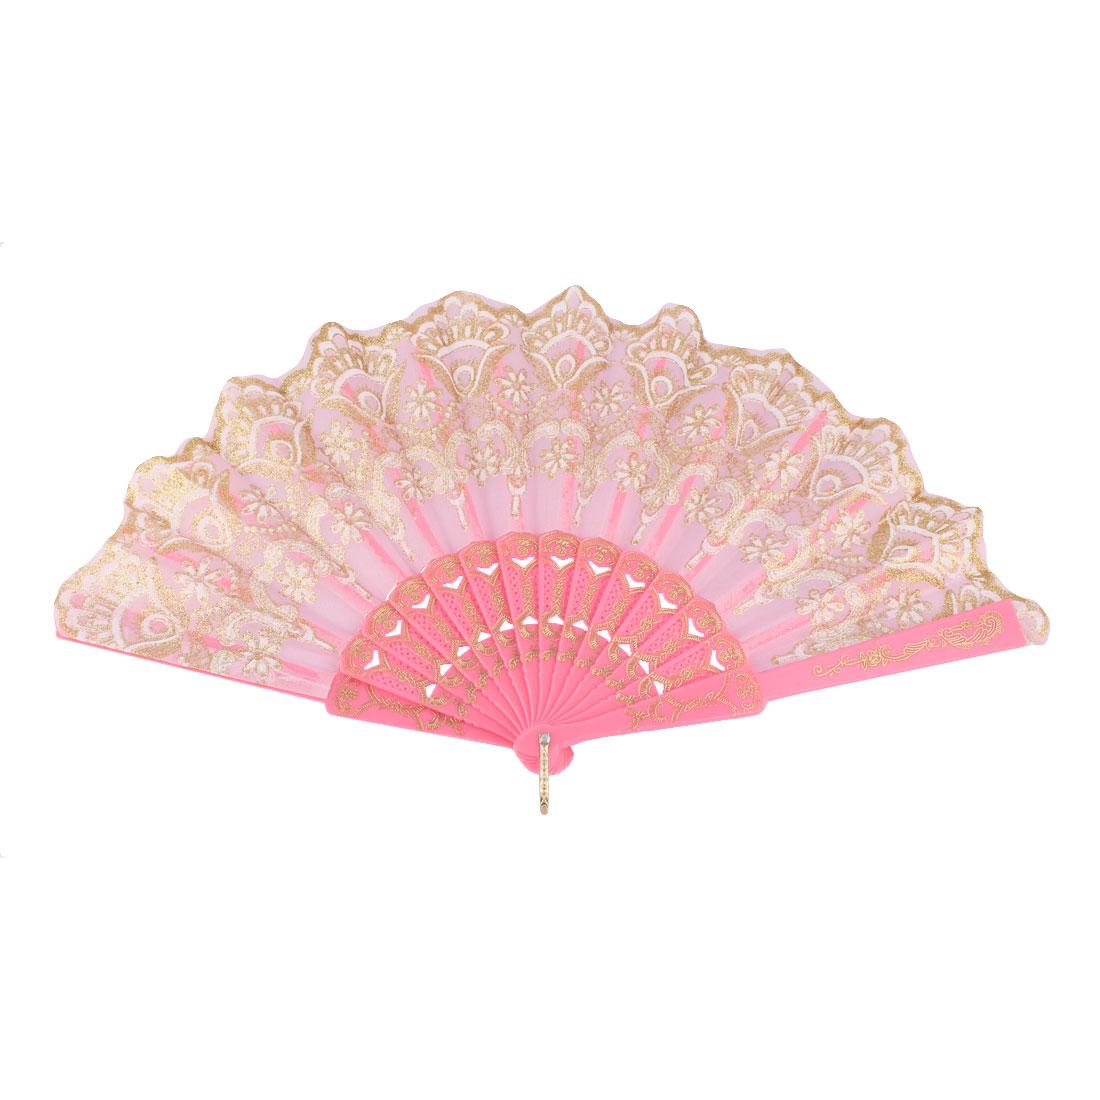 Dancing Wedding Chinese Style Flower Pattern Folding Fan Gold Tone Pink